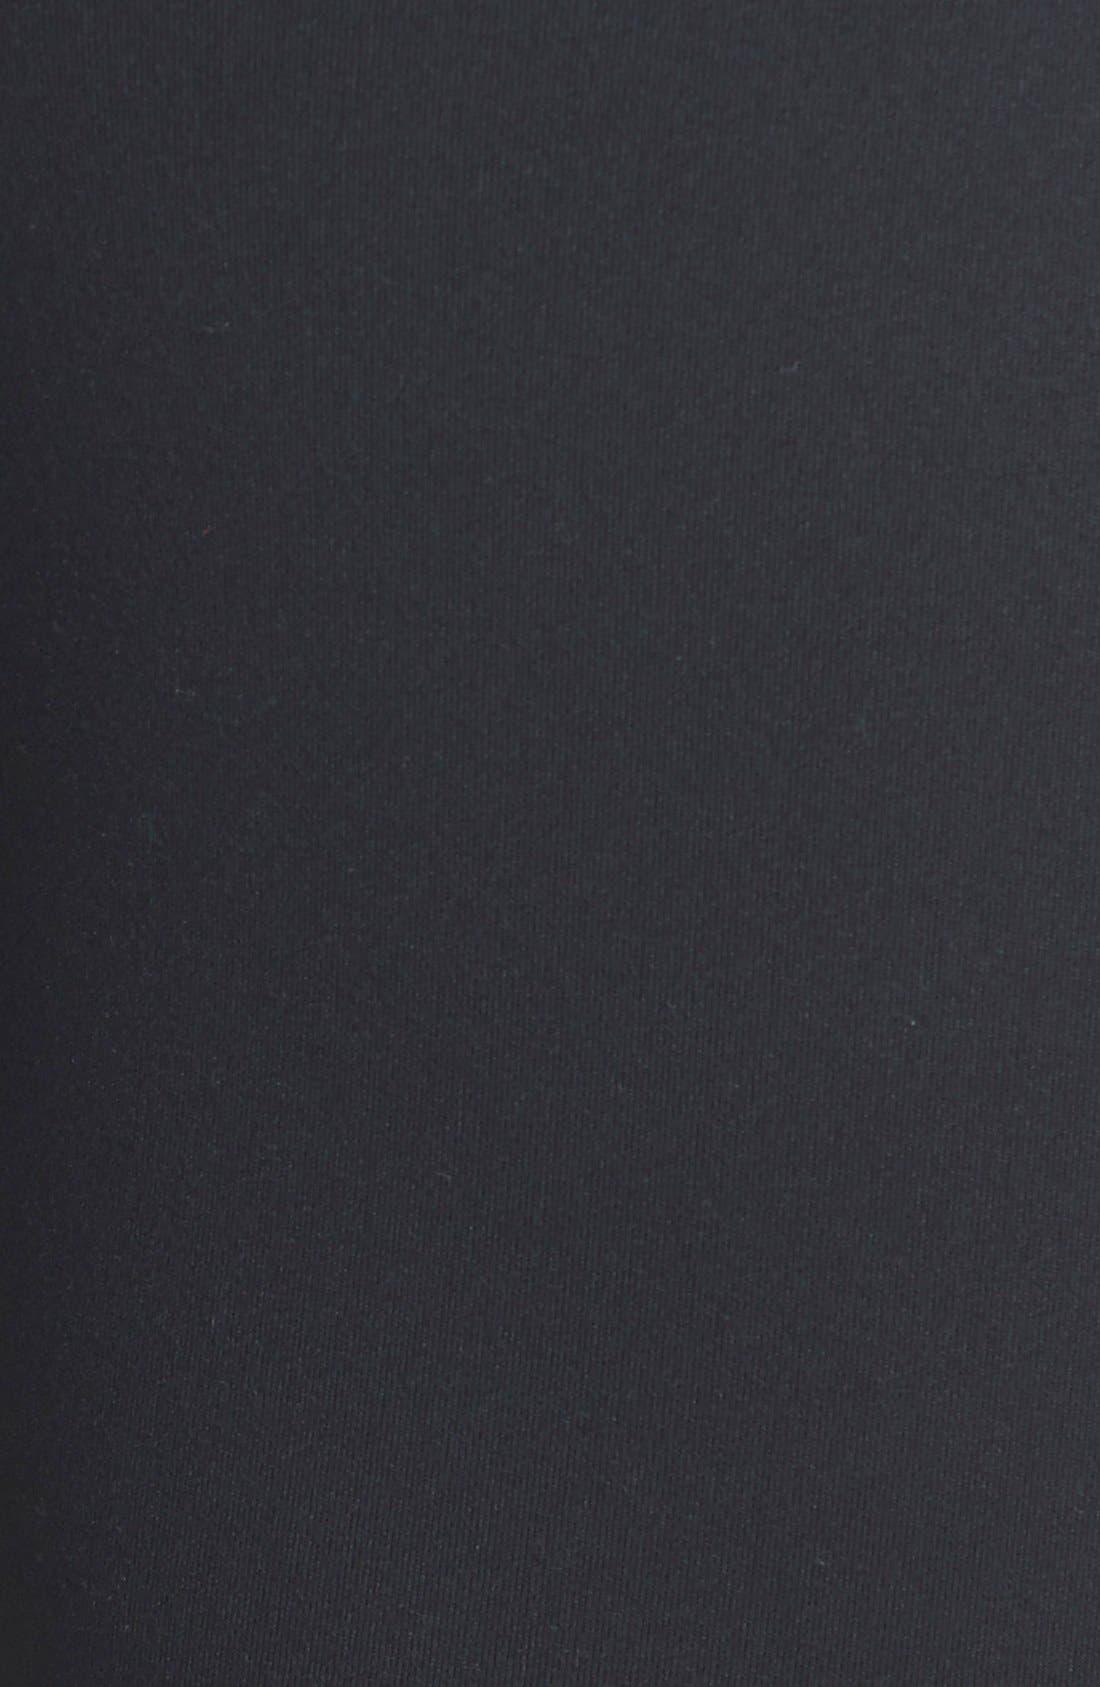 'Live In - Hot' Mesh Detail Capris,                             Alternate thumbnail 4, color,                             Black